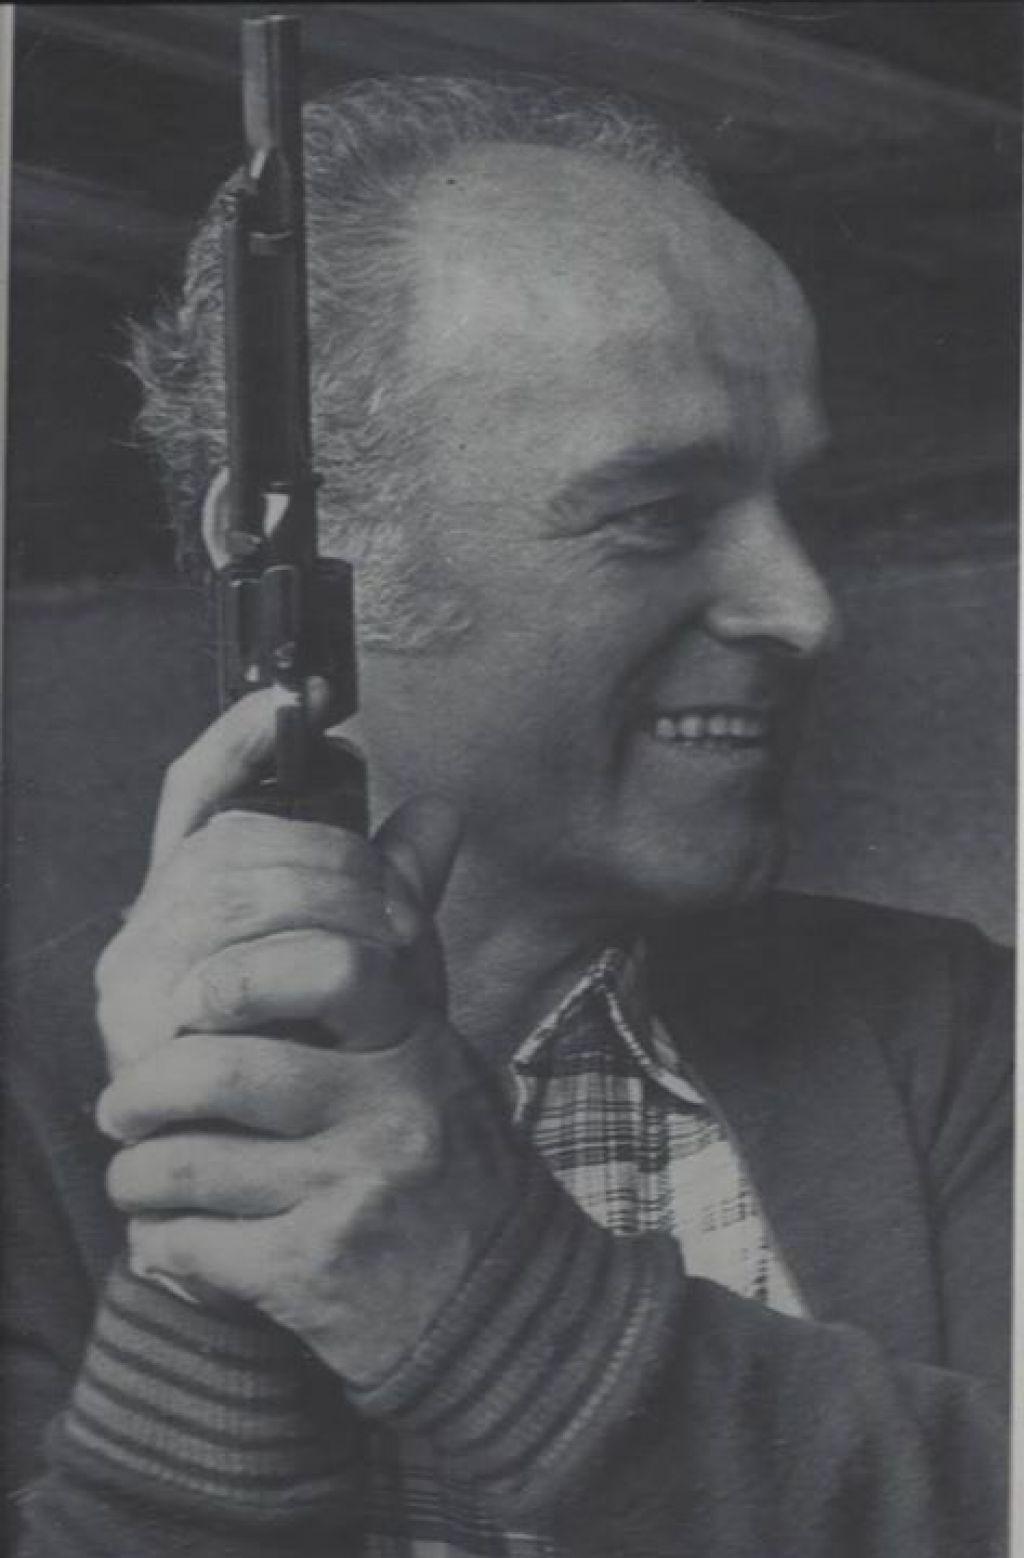 Umrl olimpijec Franc Peternel